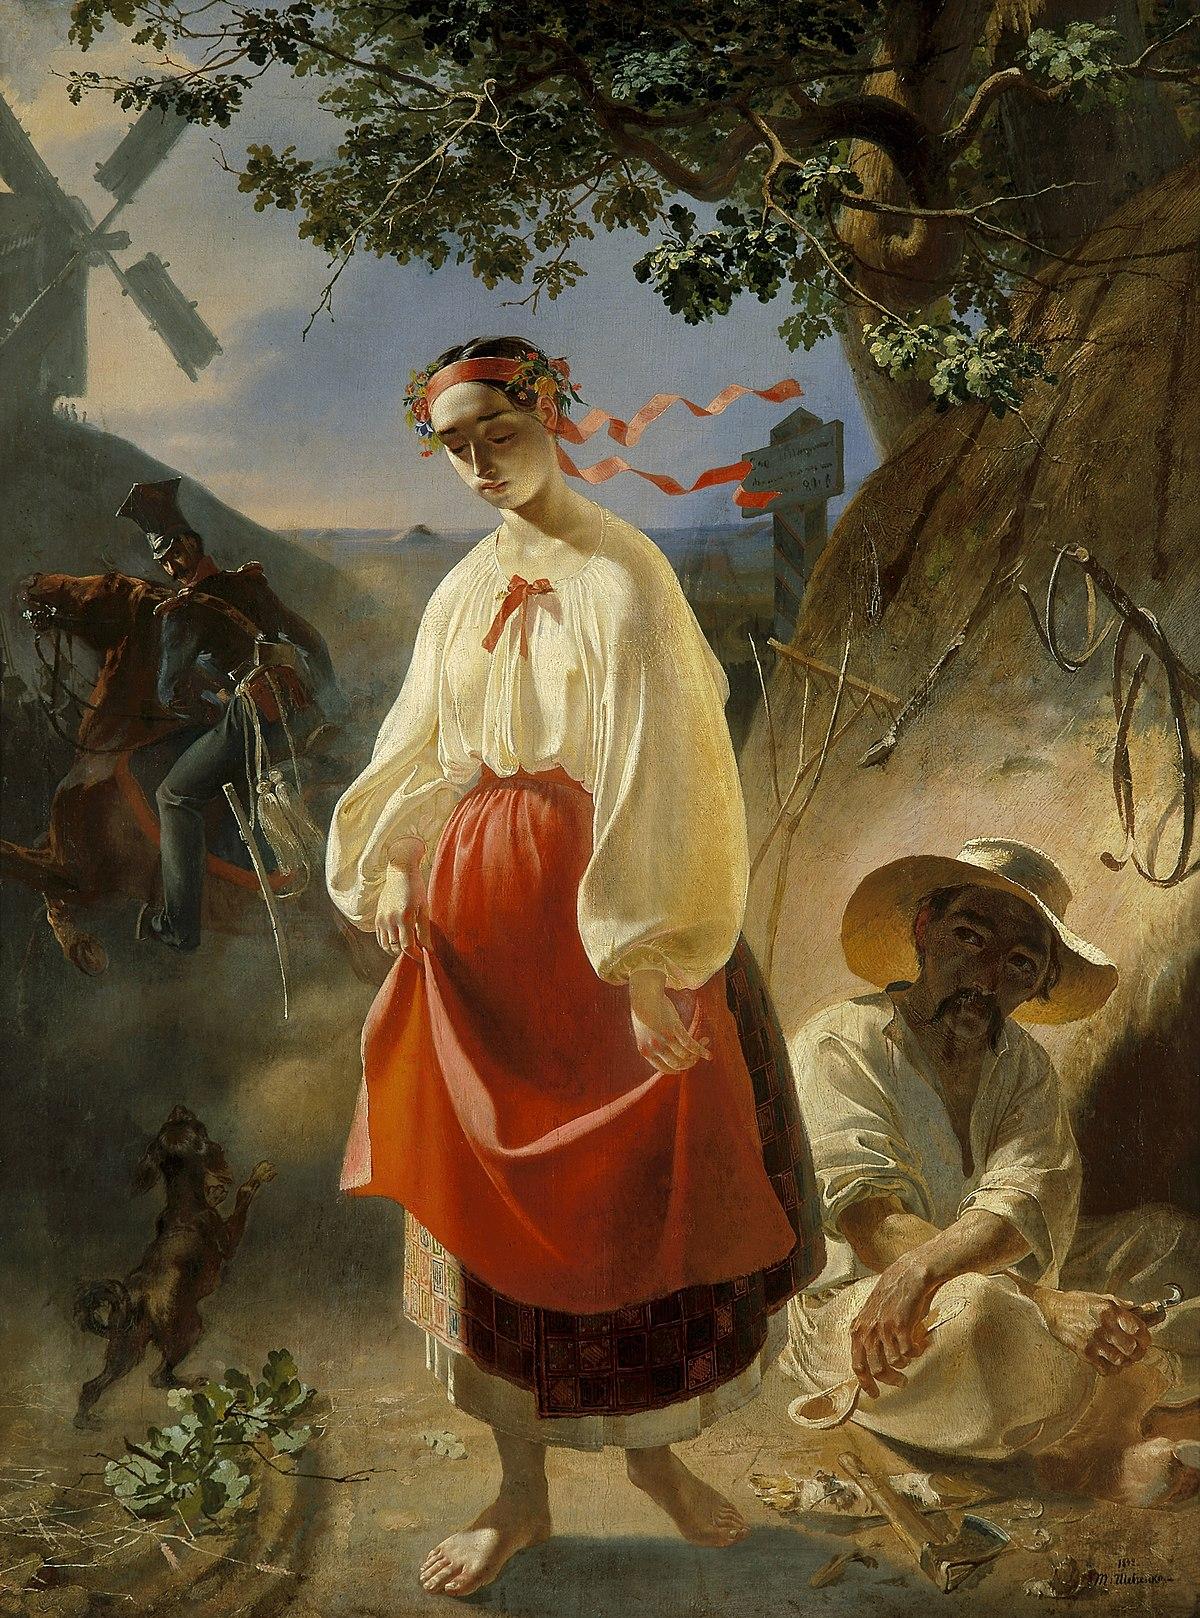 Taras Shevchenko, Kateryna, oil on canvas, 1842.